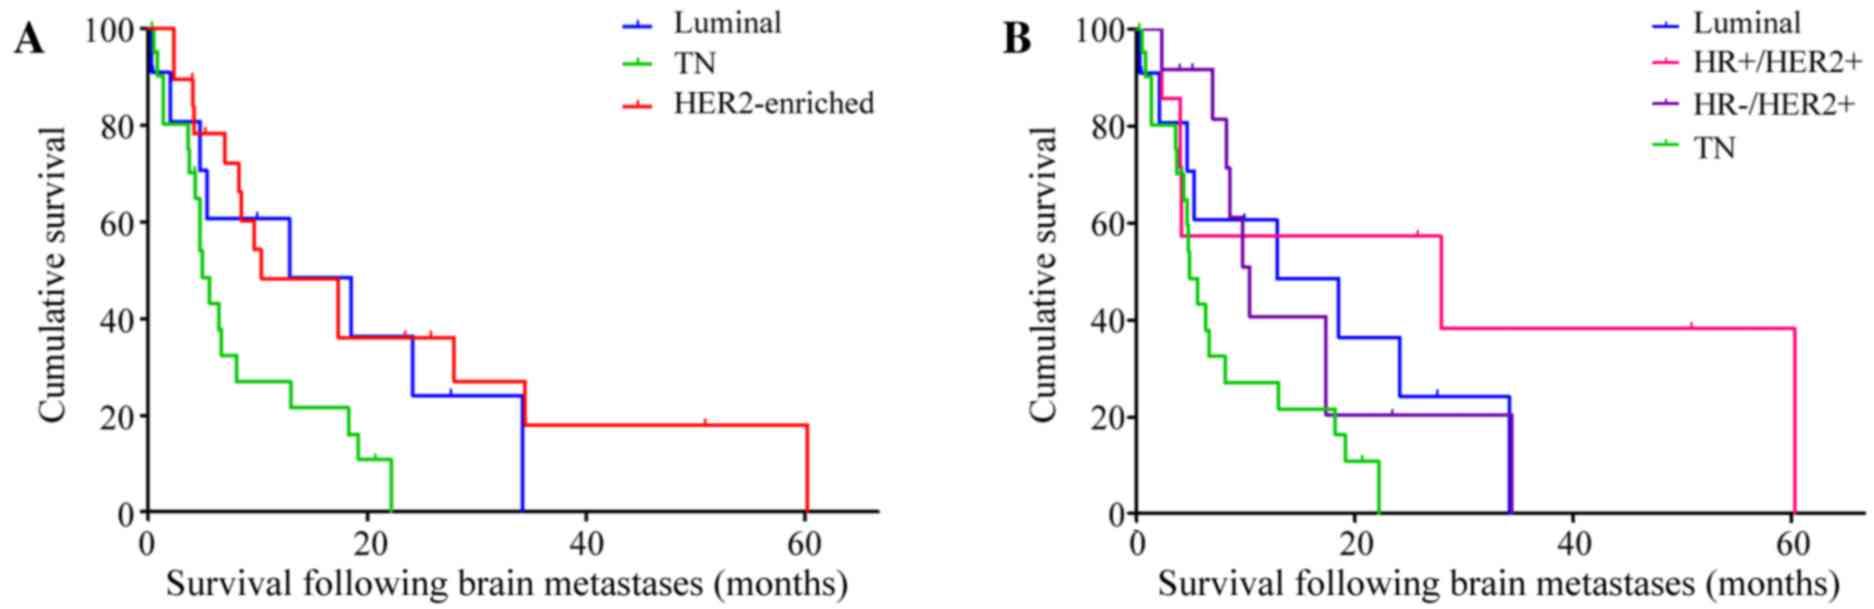 cancer metastatic to brain prognosis)